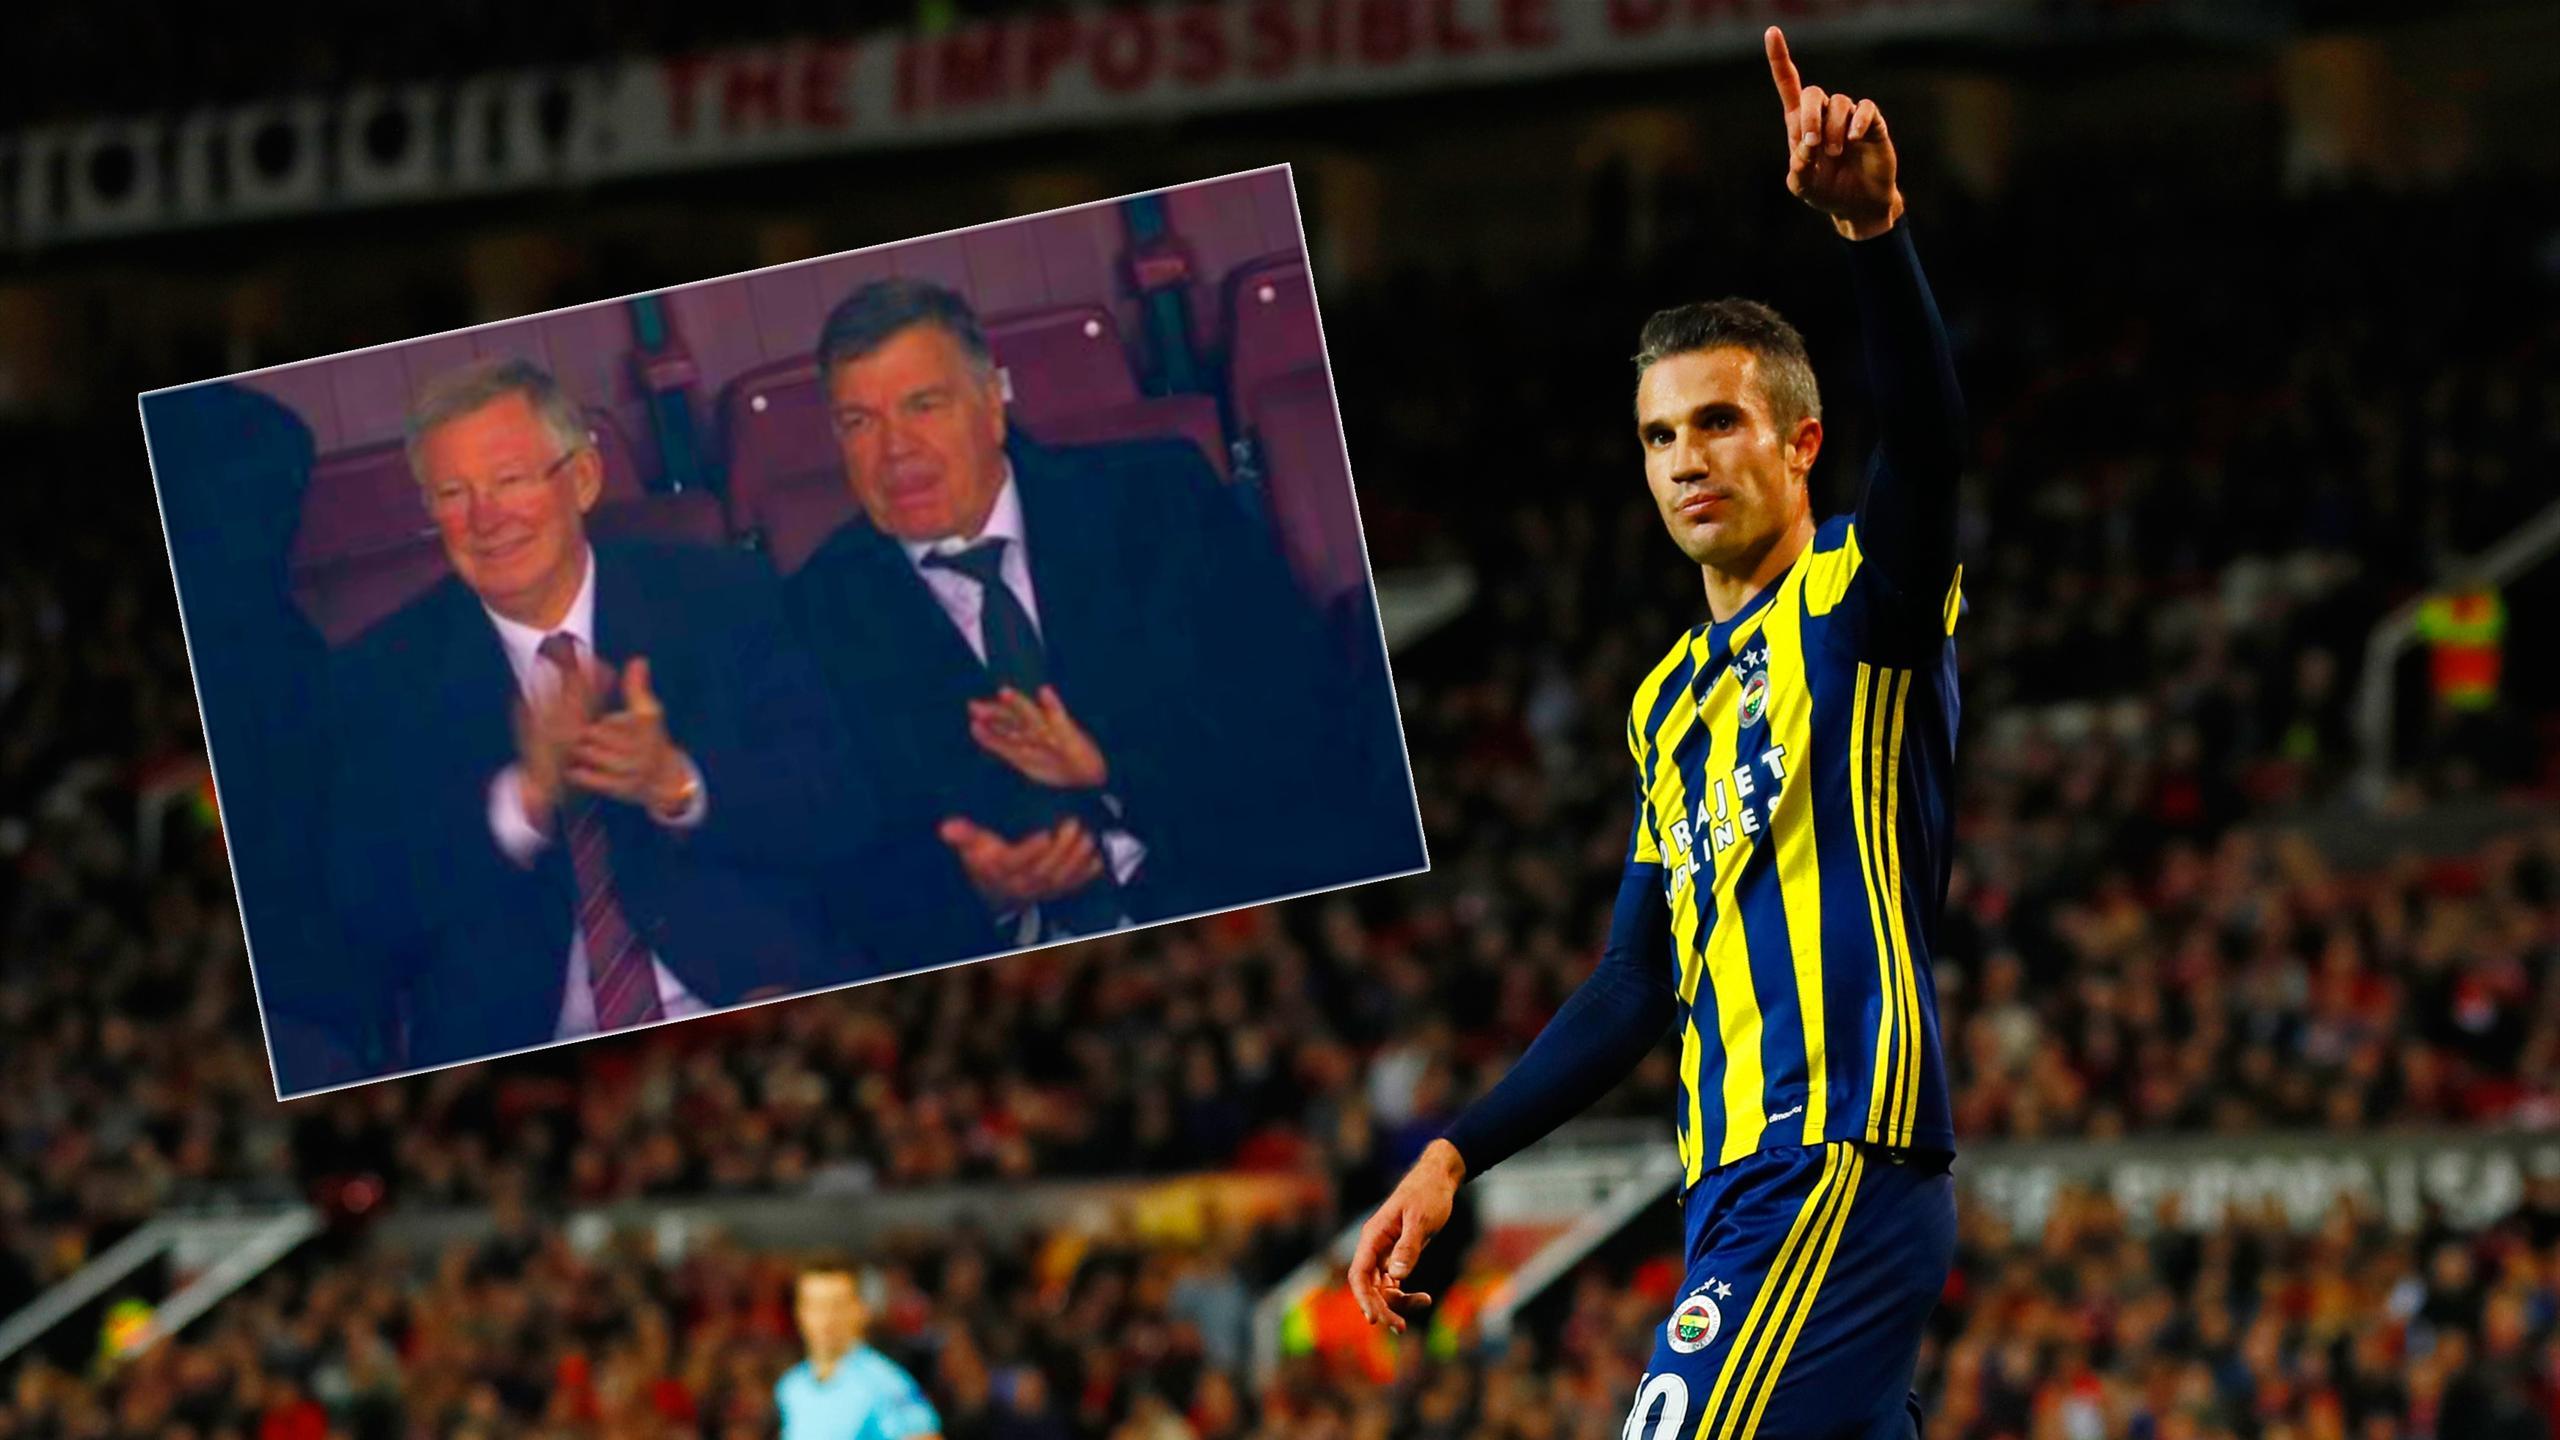 Sir Alex Ferguson and Sam Allardyce applaud Robin van Persie scoring for Fenerbahce against Manchester United